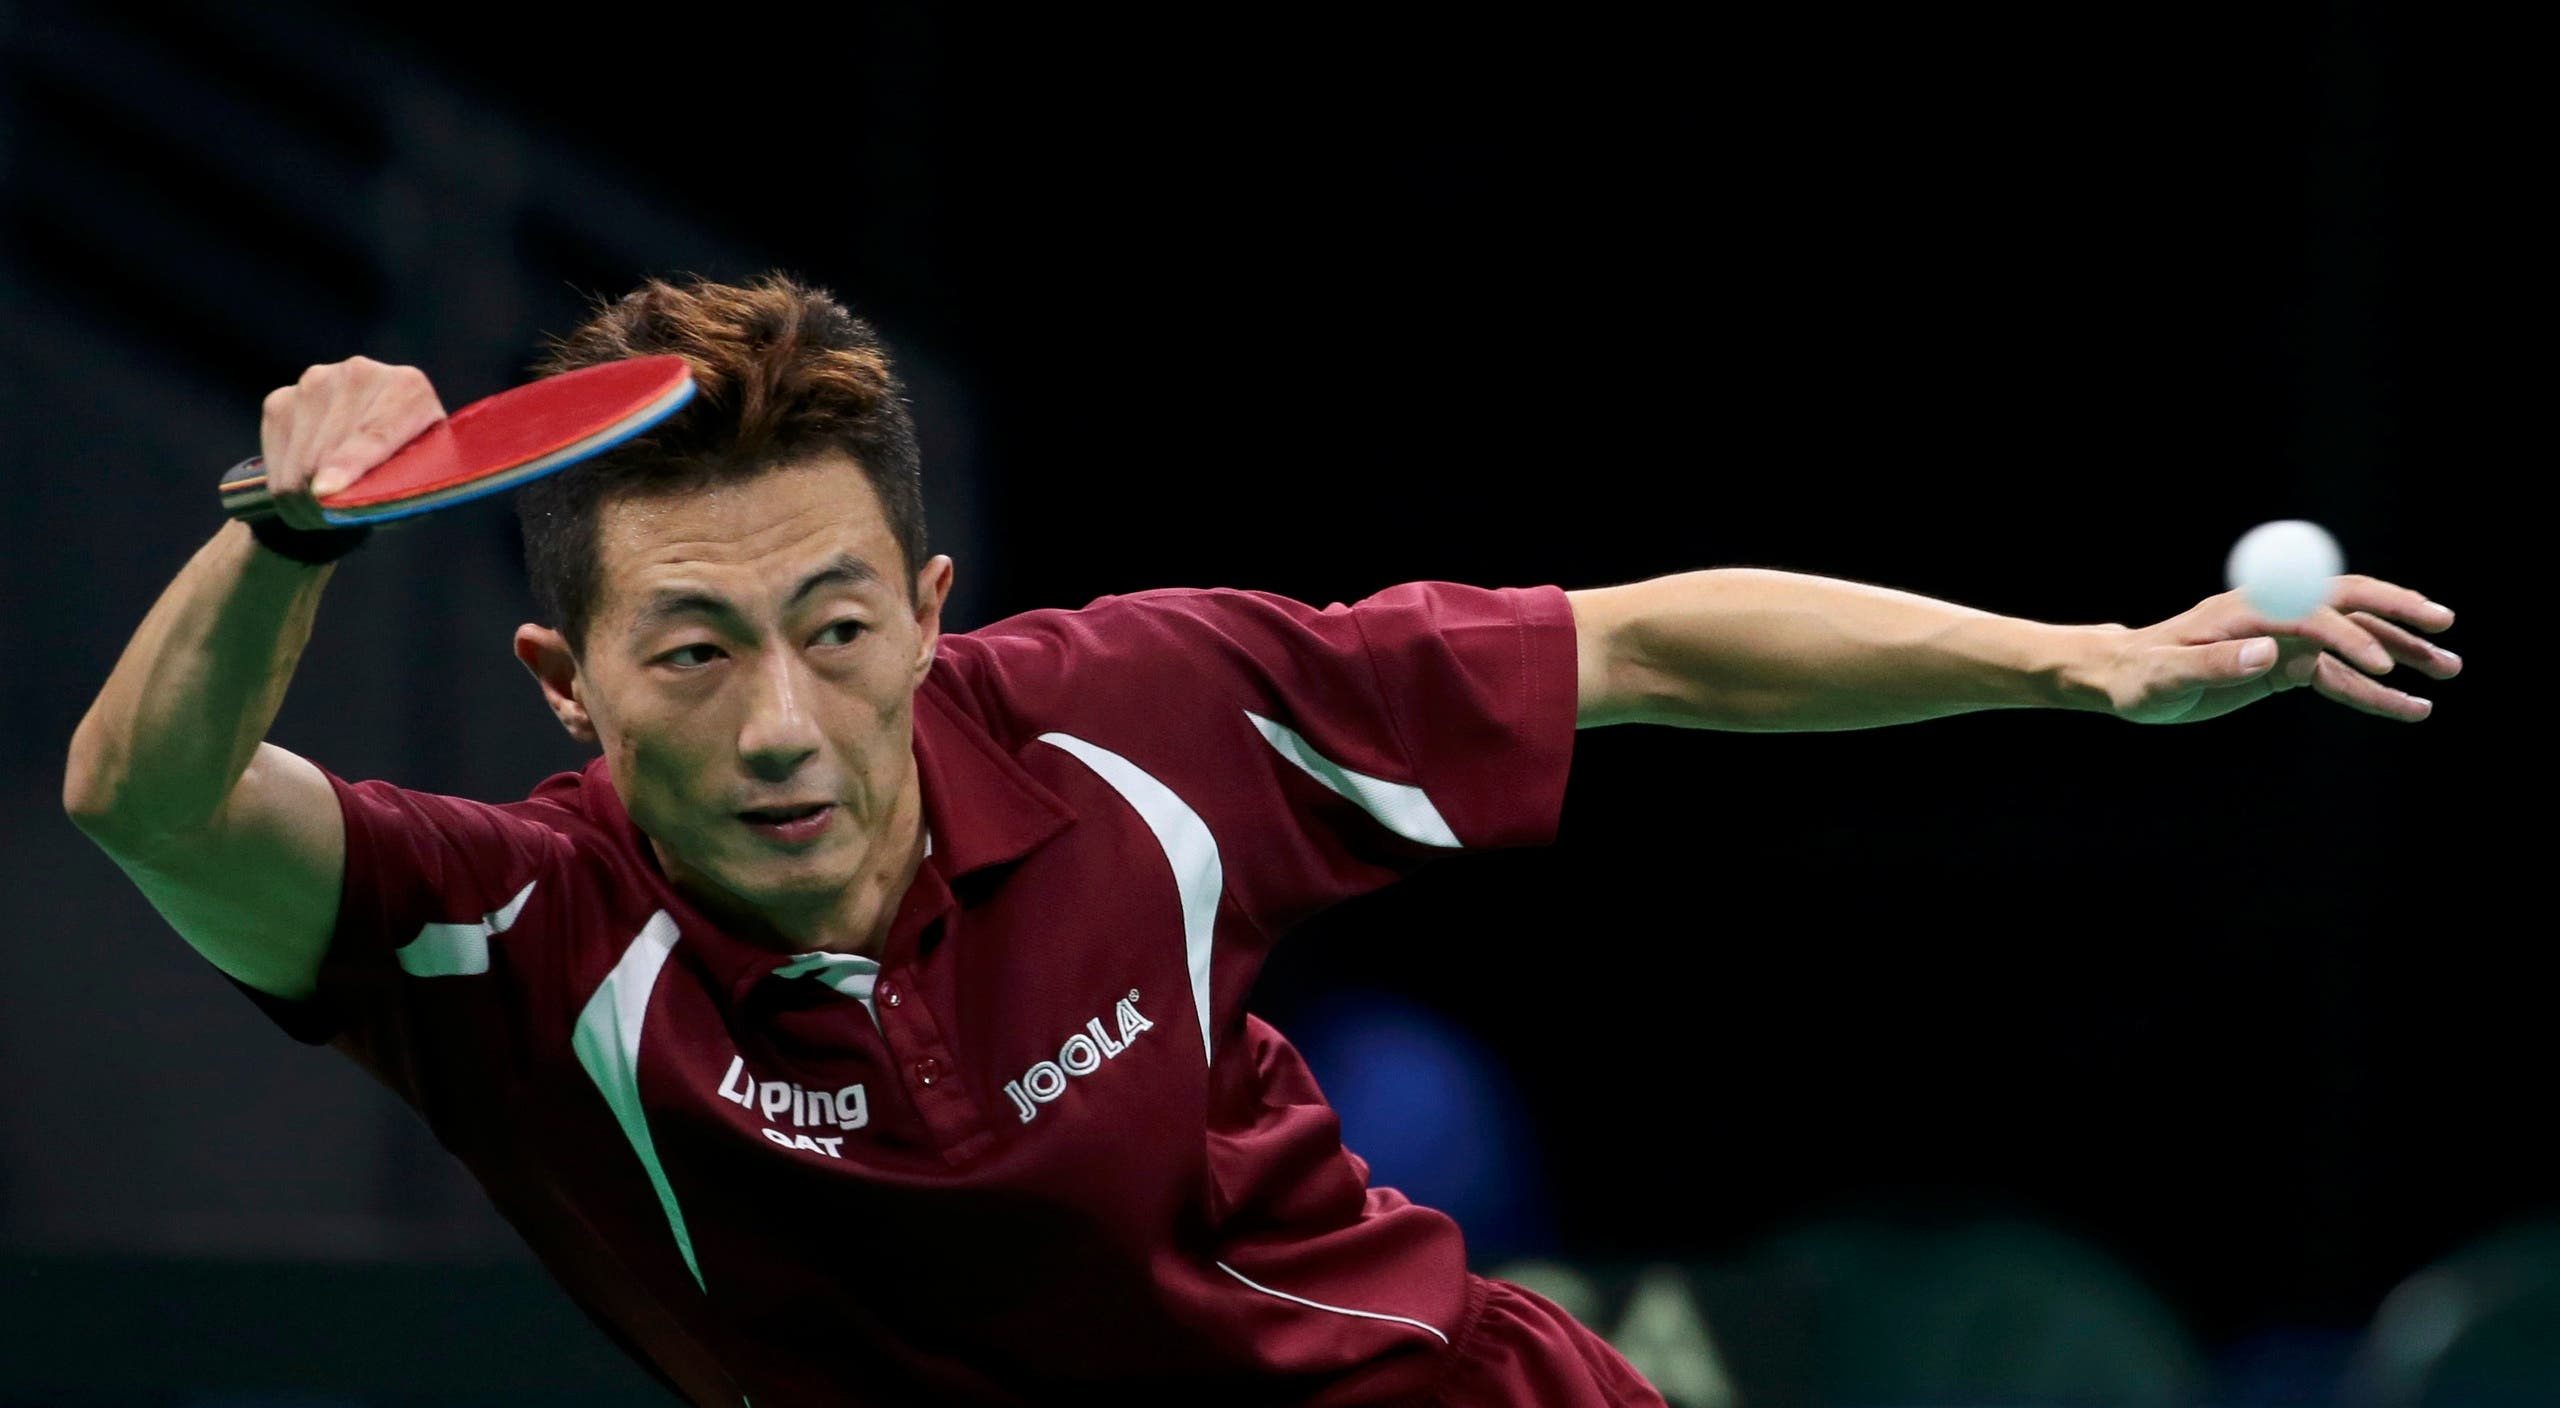 Li Ping (QAT) of Qatar plays against Adam Pattantyus (HUN) of Hungary. REUTERS